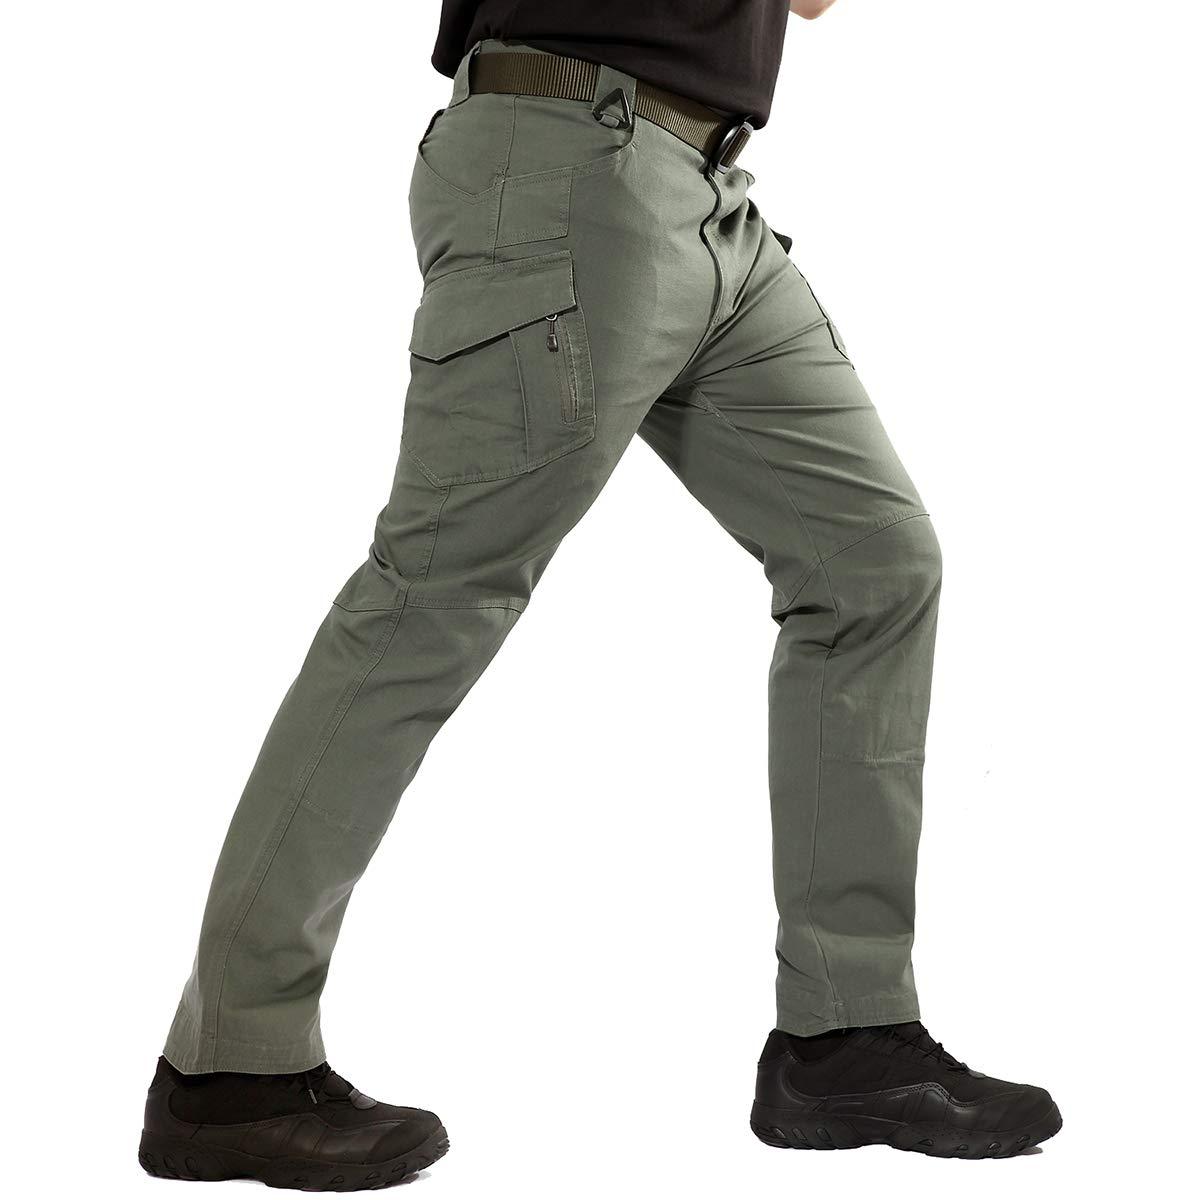 ReFire Gear Men's Assault Tactical Pants Lightweight Cotton Outdoor Military Combat Cargo Trousers